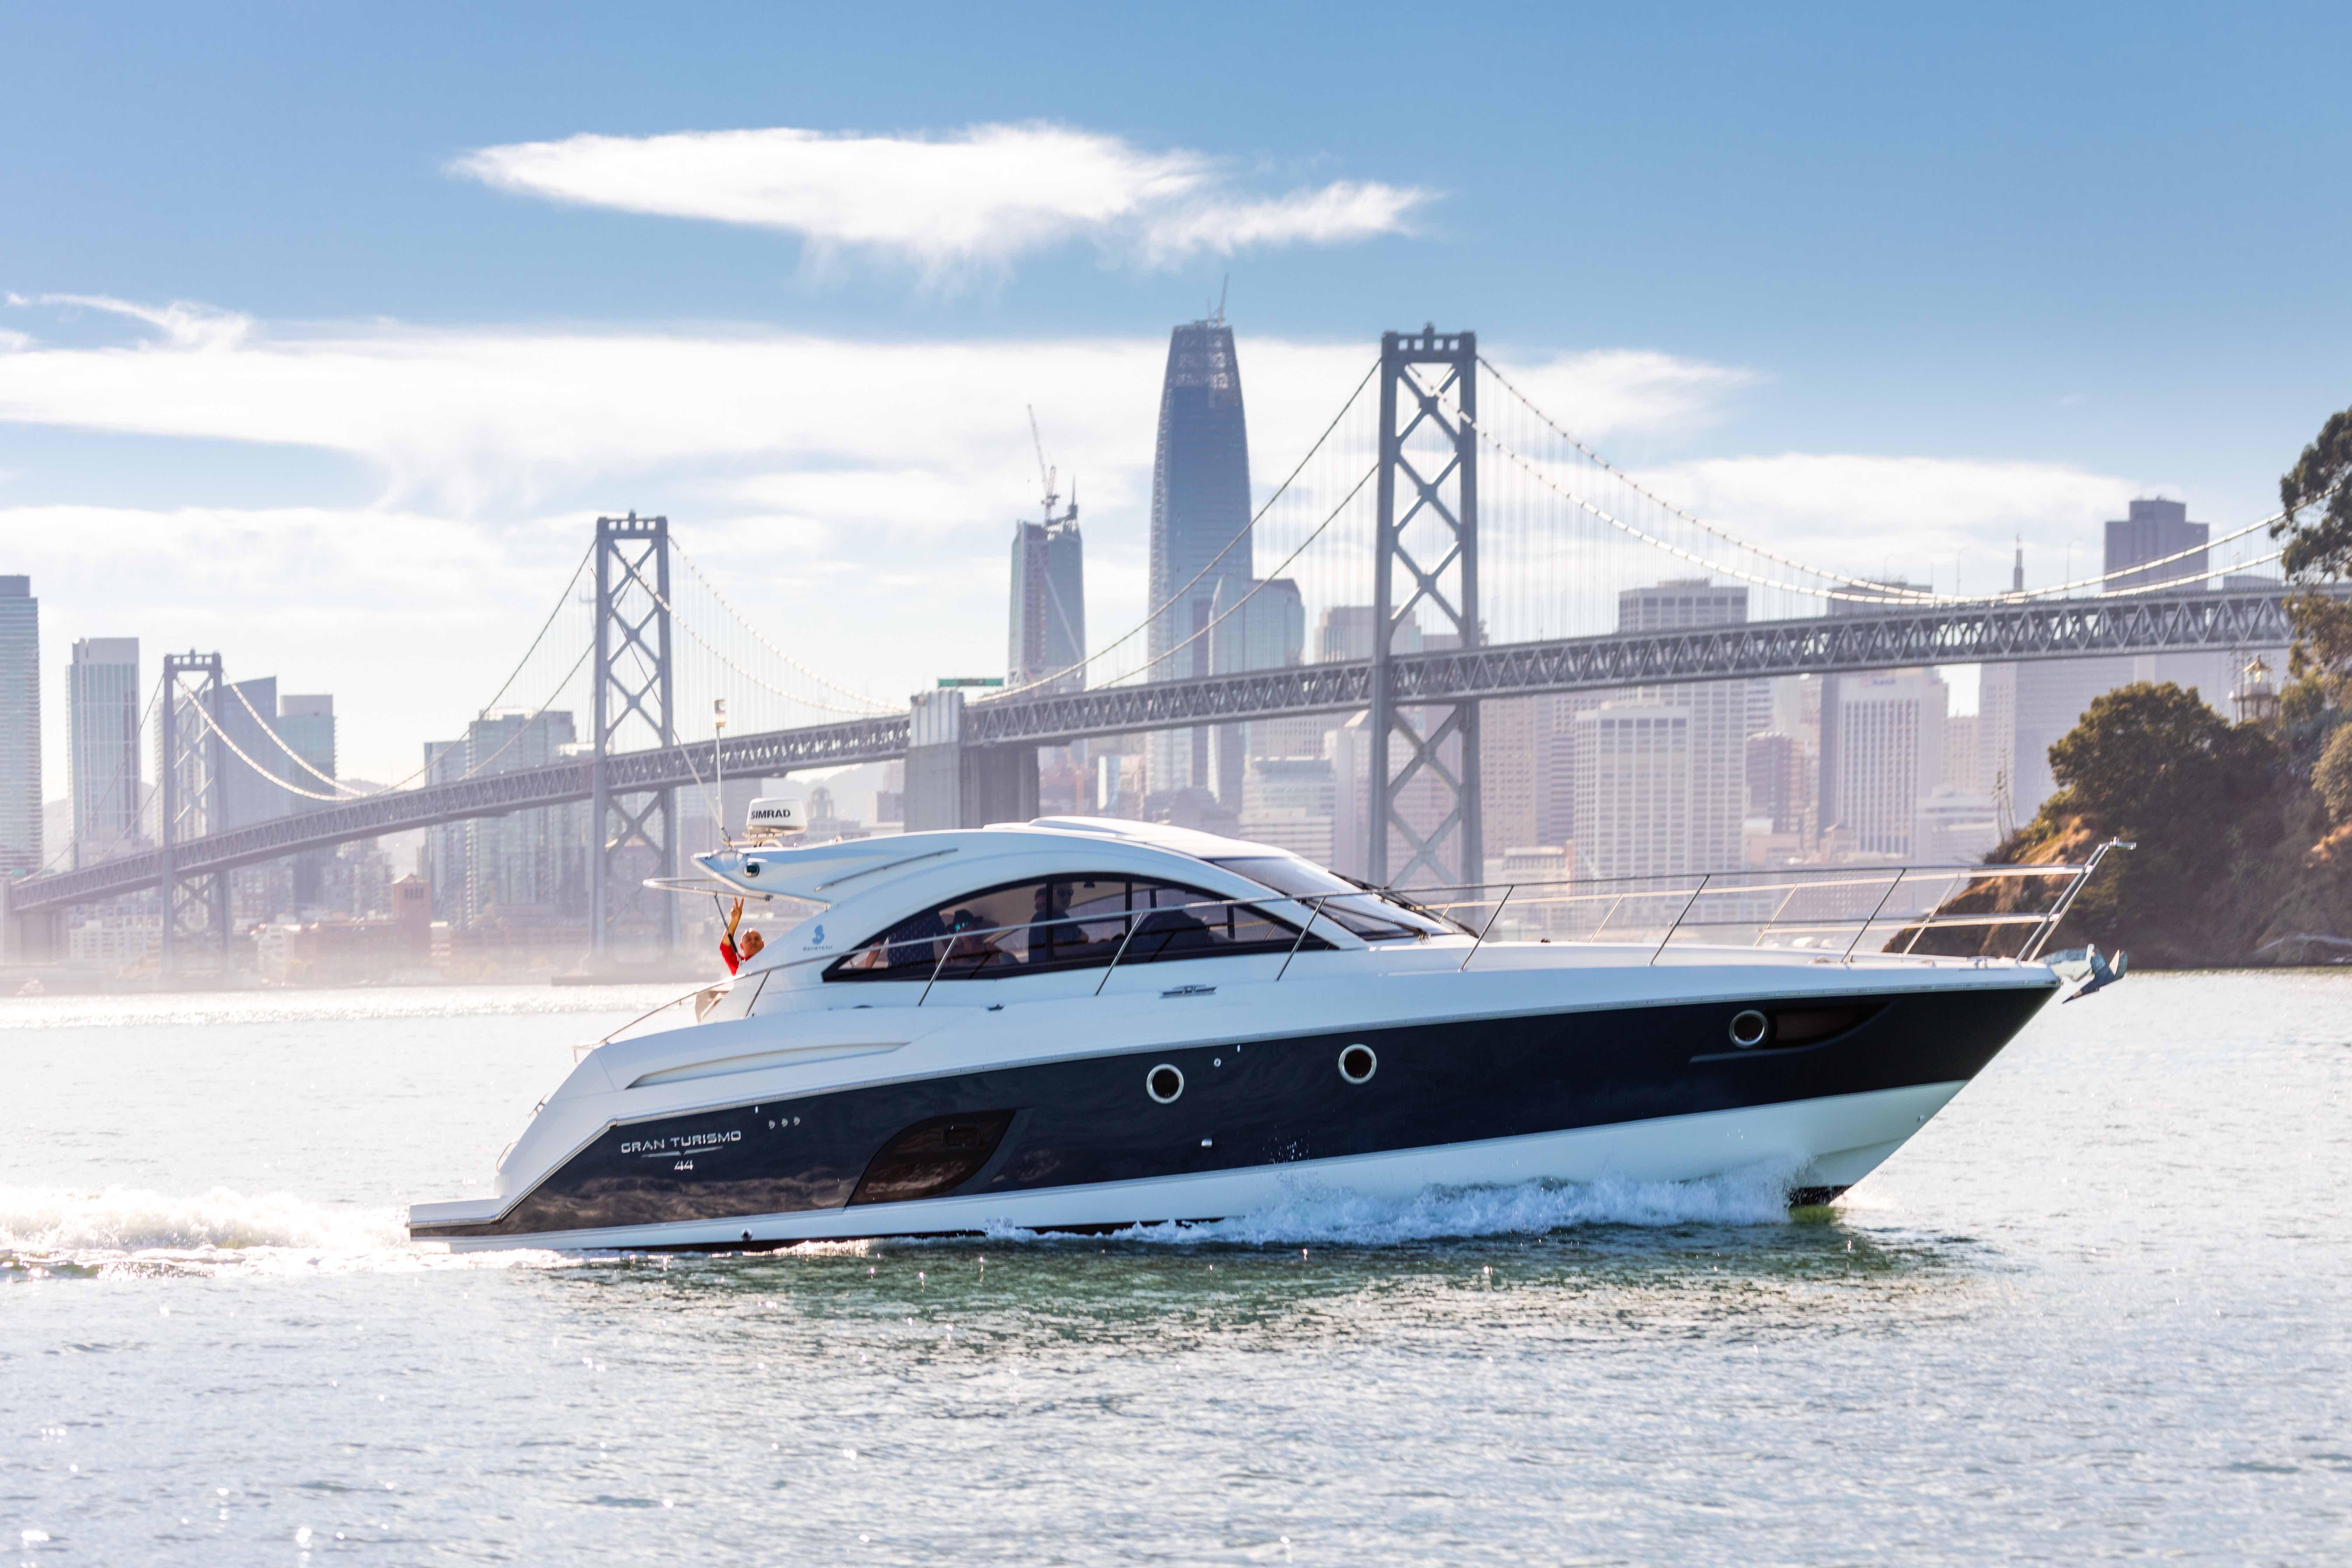 Gran Turismo 44 Powerboat